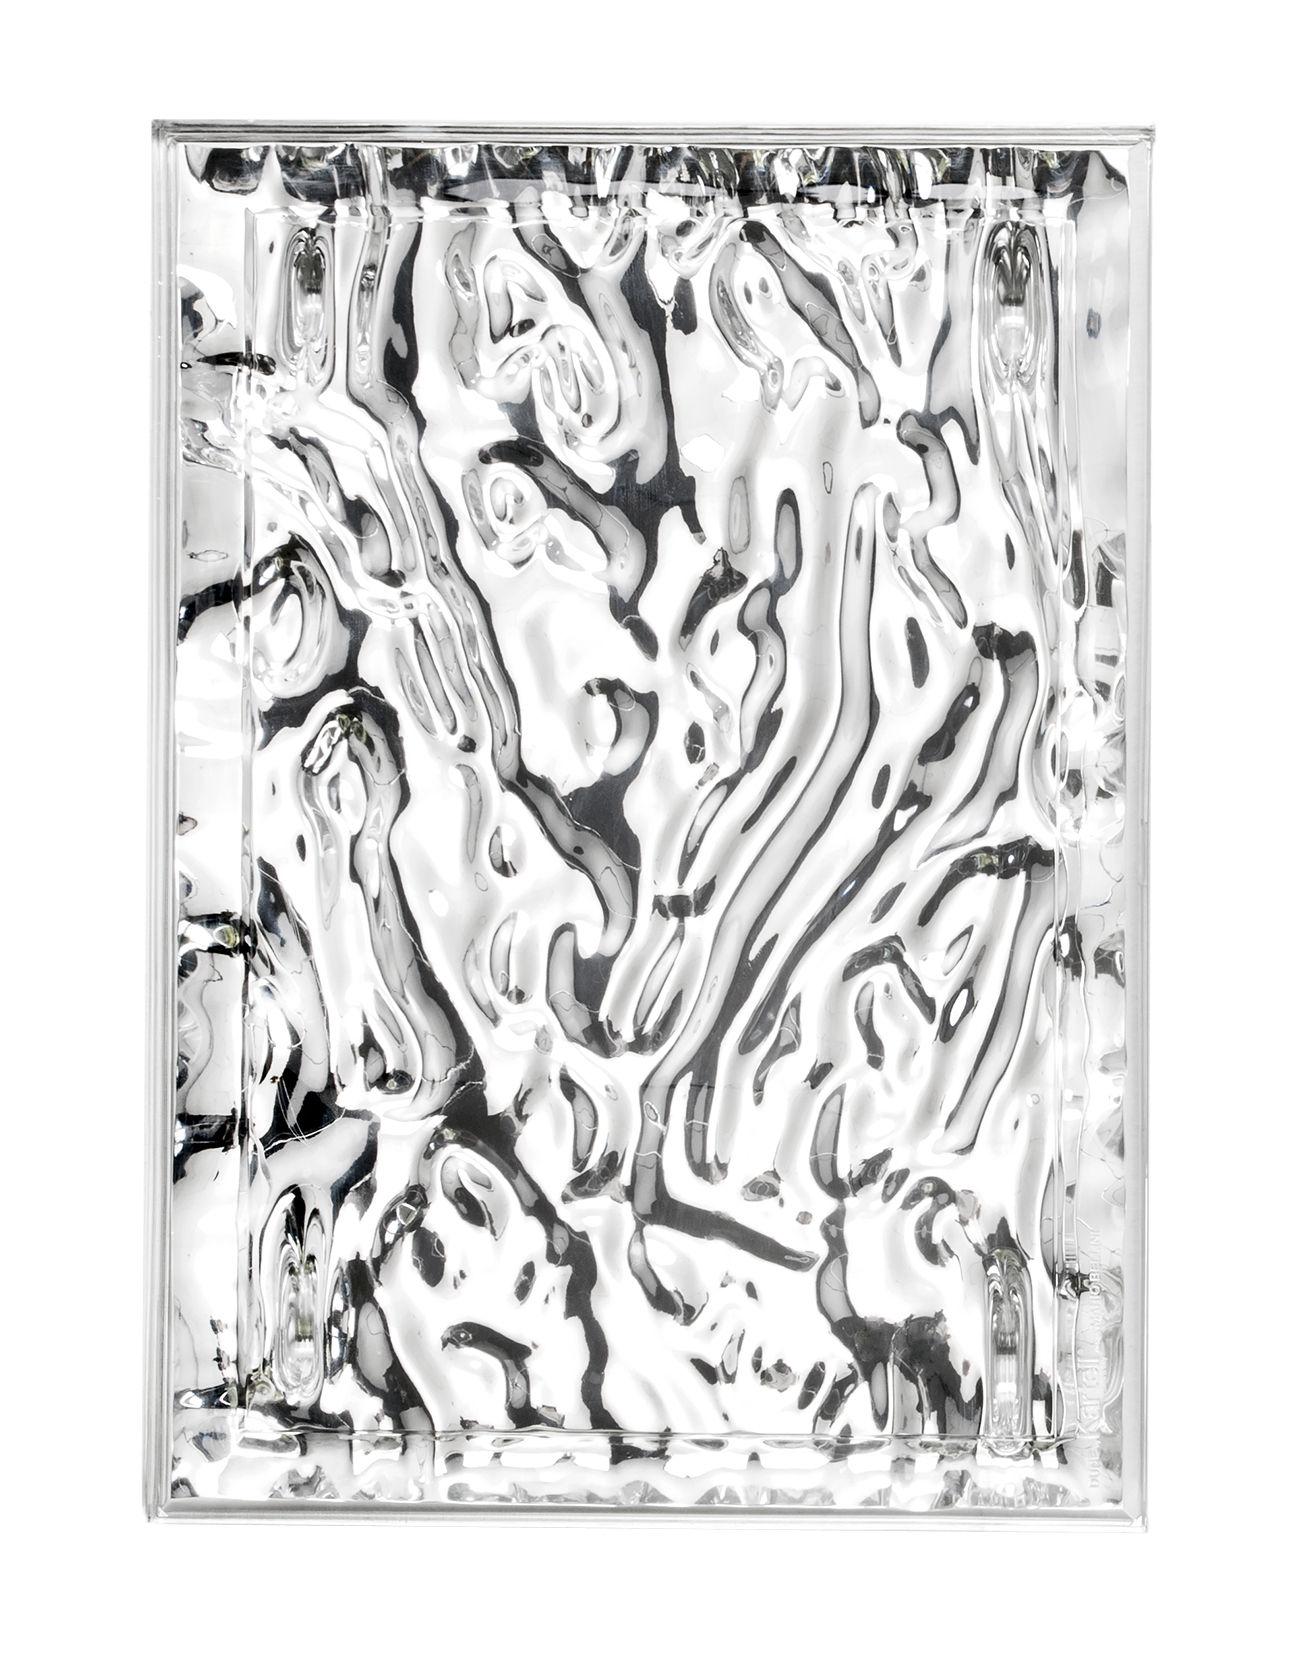 Tischkultur - Tabletts - Dune Small Tablett / 46 x 32 cm - metallic - Kartell - Chrom-glänzend - PMMA métallisé